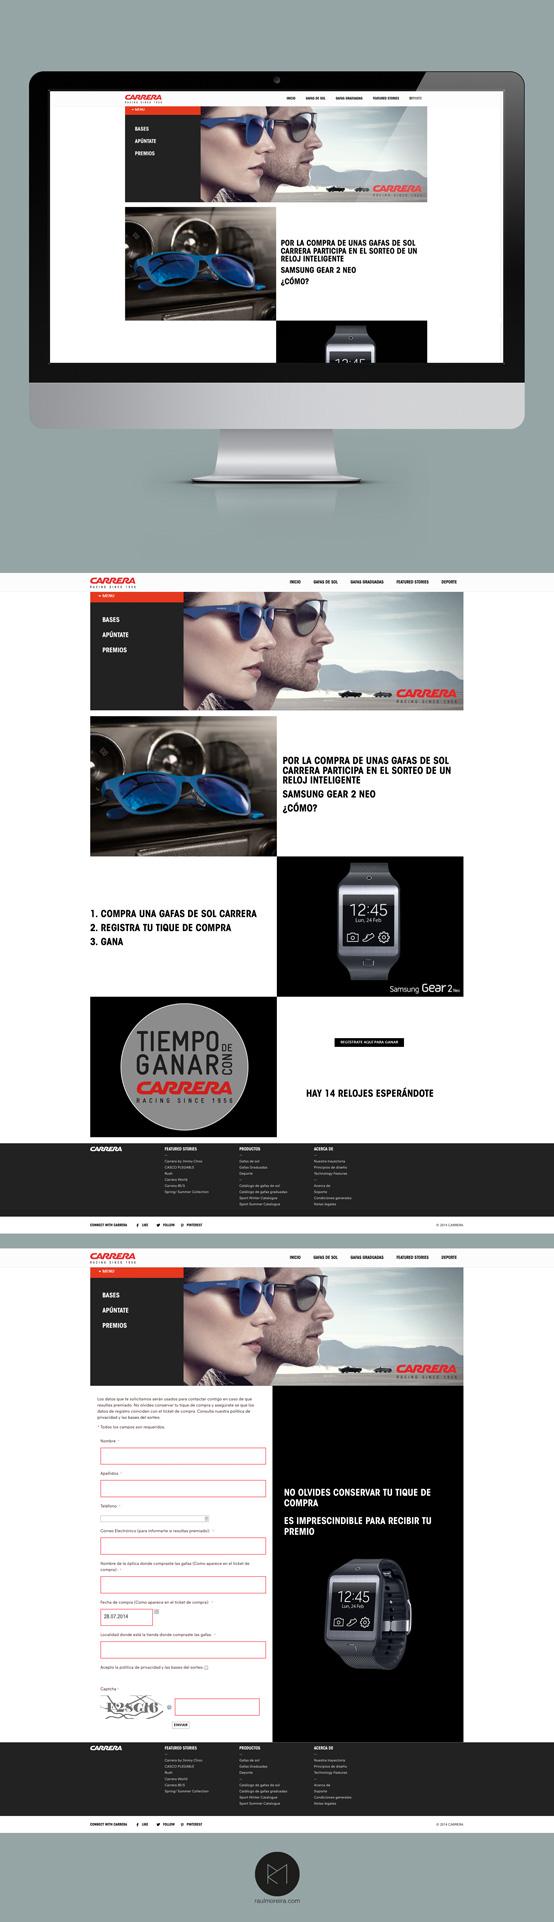 tiempodeganarconcarrera.com - minisite